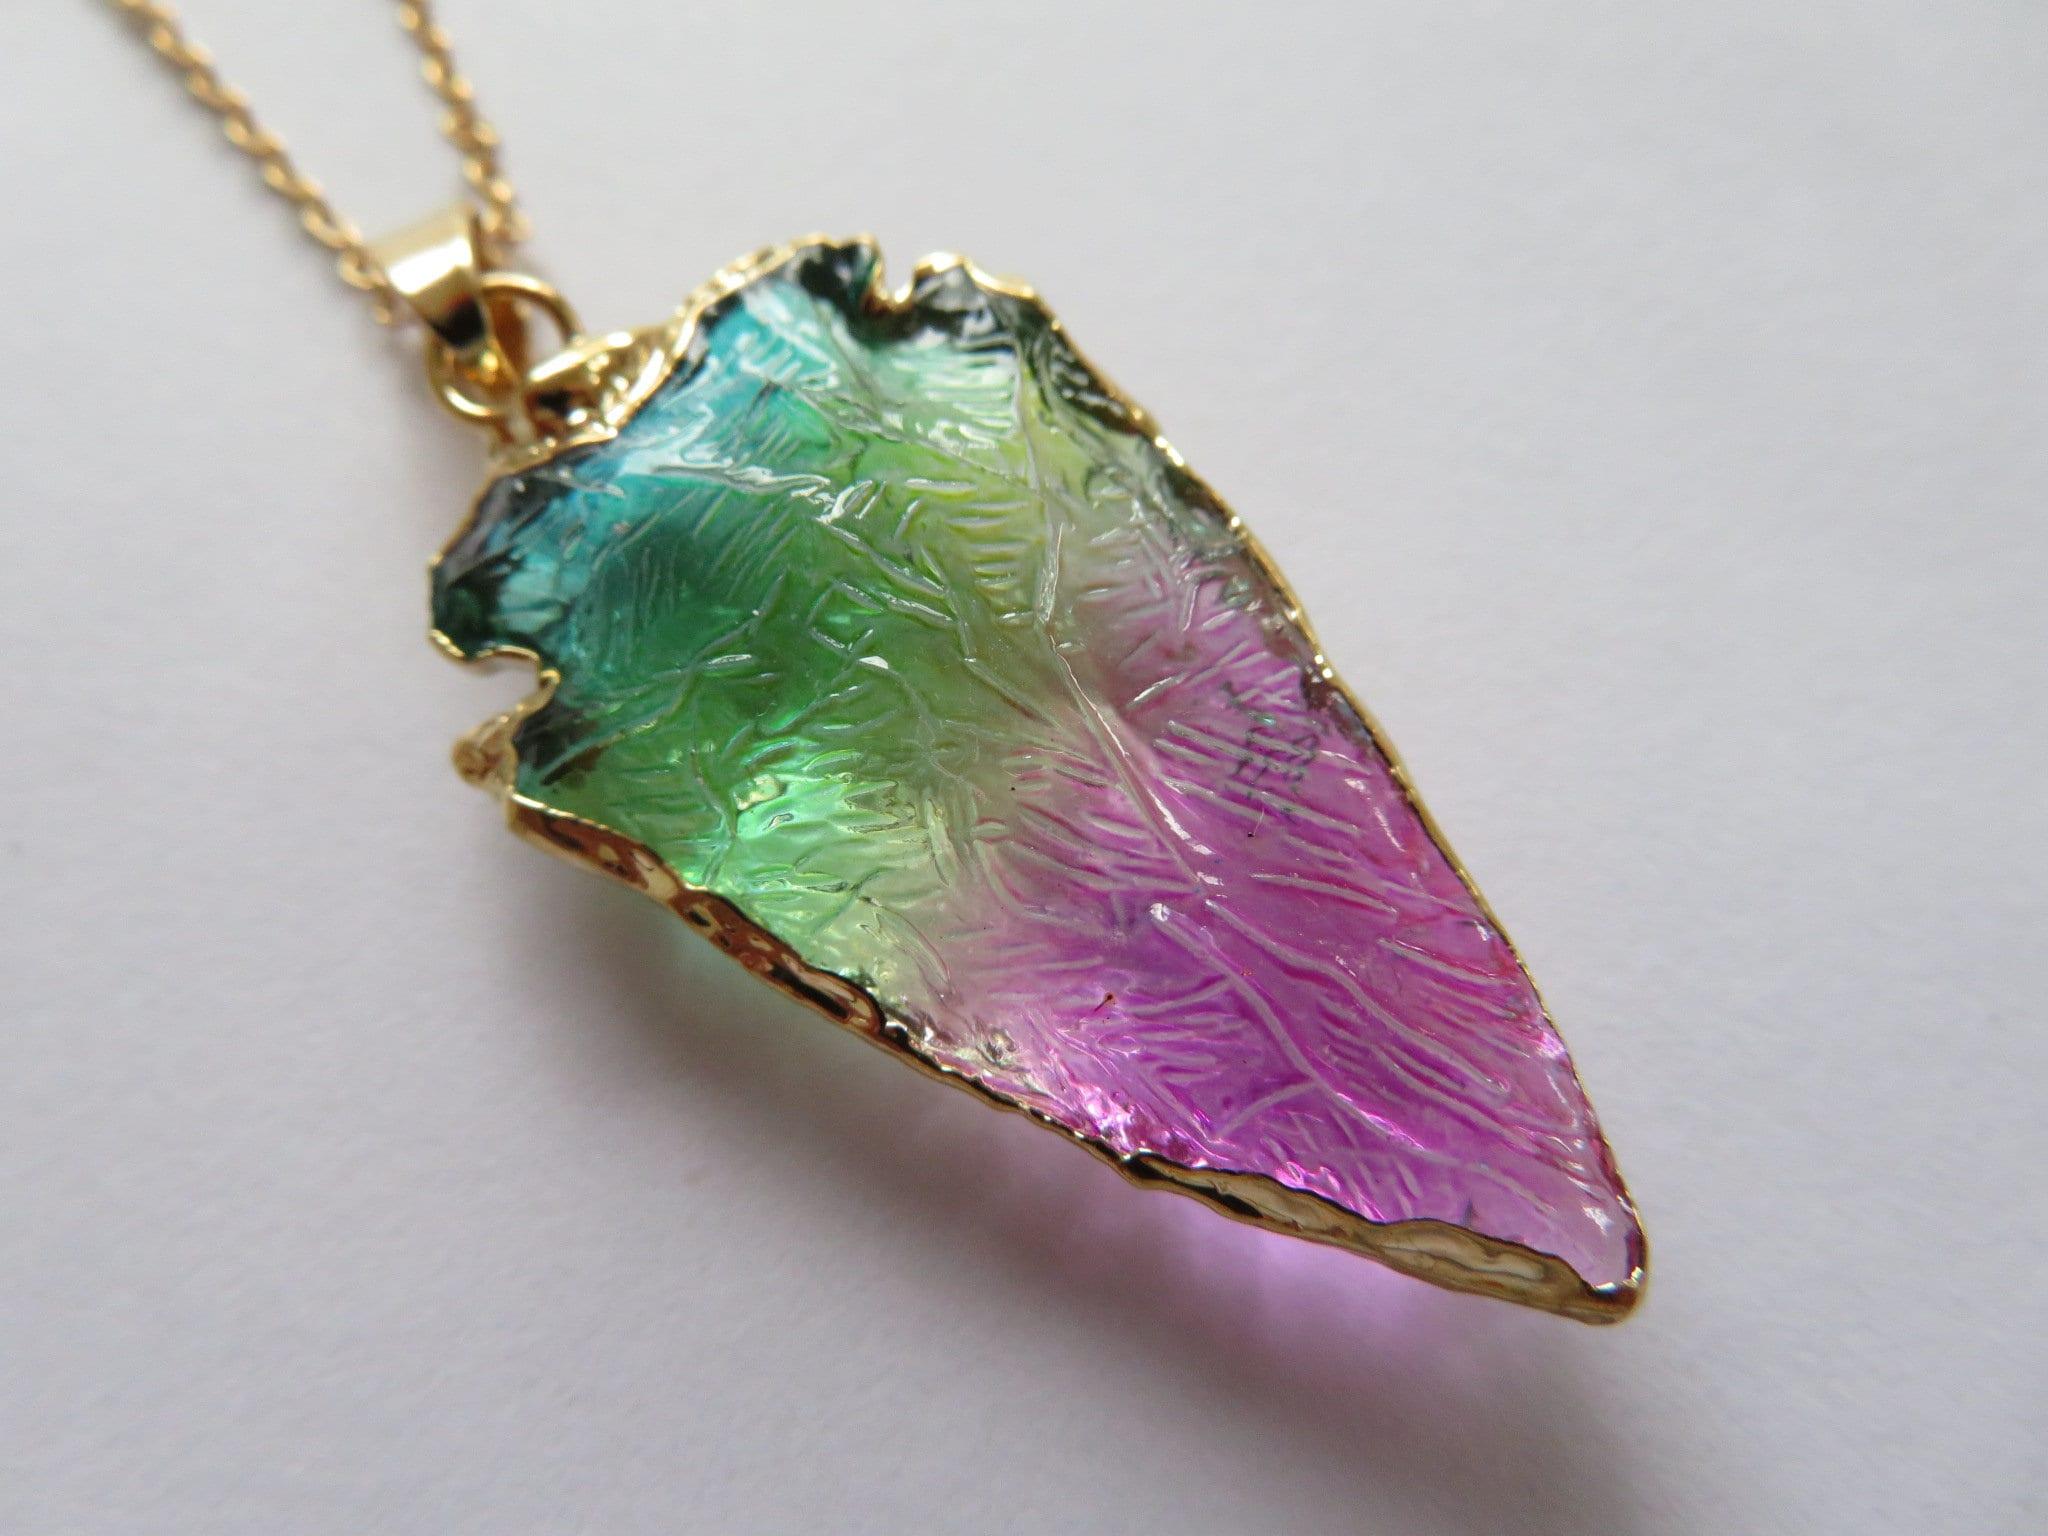 Chakra Arrow Crystal Quartz Pendant Gold Filled Raw Stone Necklace Gemstone